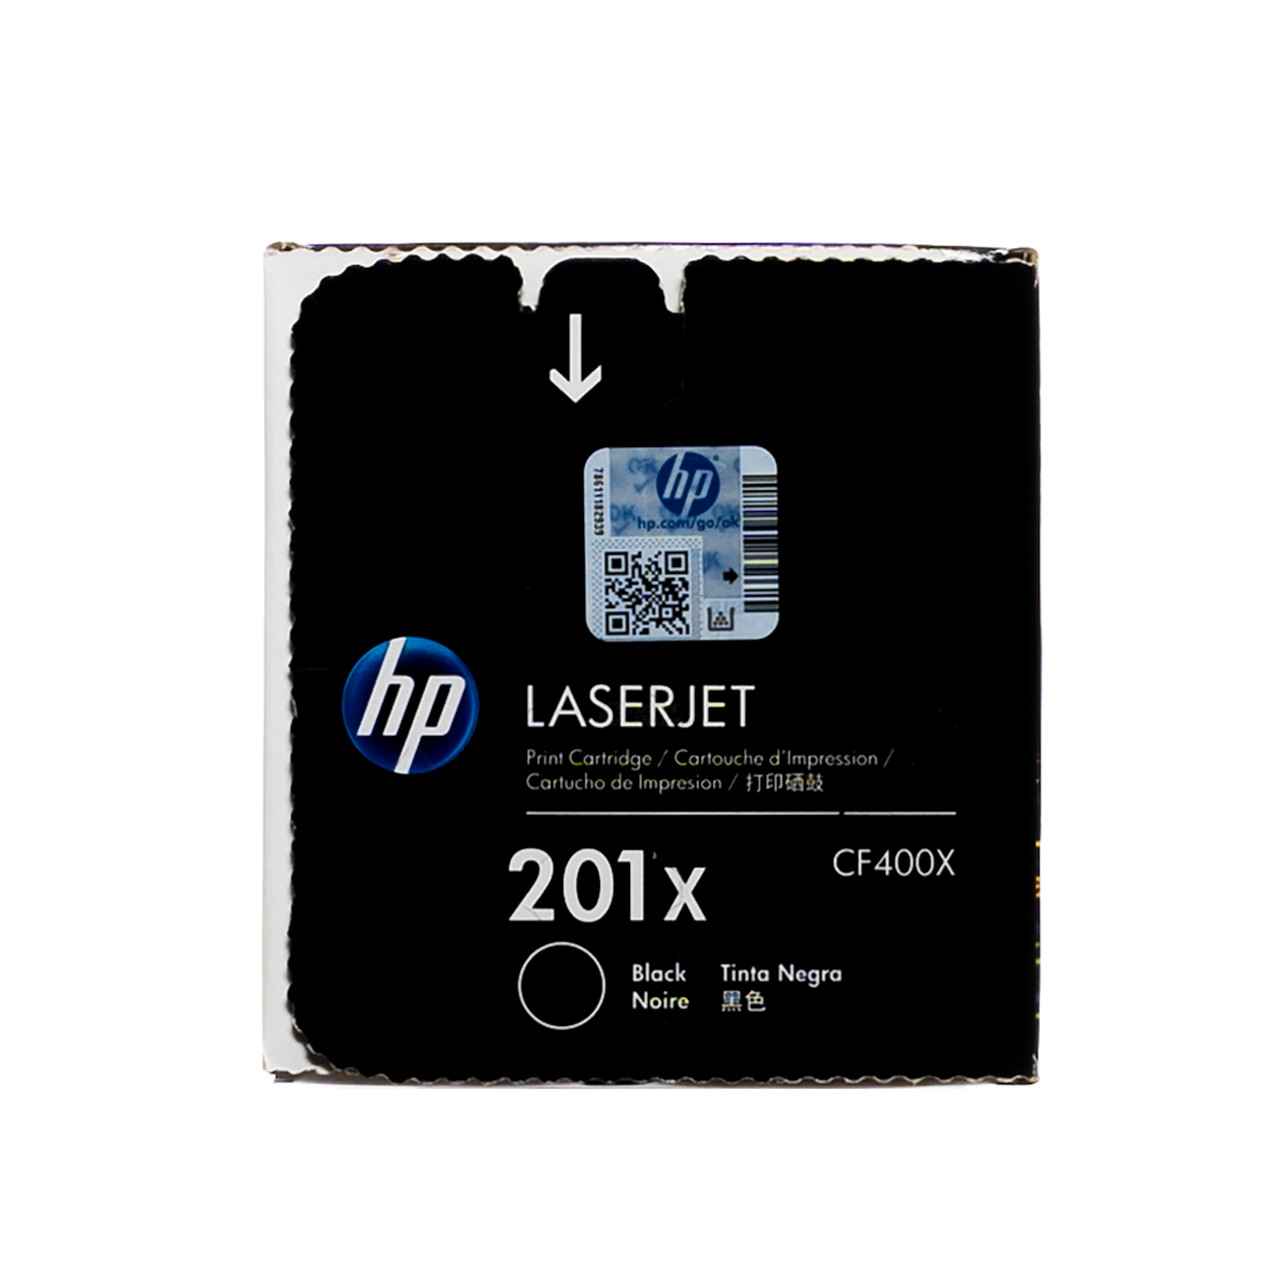 201X Black High Yield Toner Cartridge Genuine OEM Original BRAND NEW HP CF400X